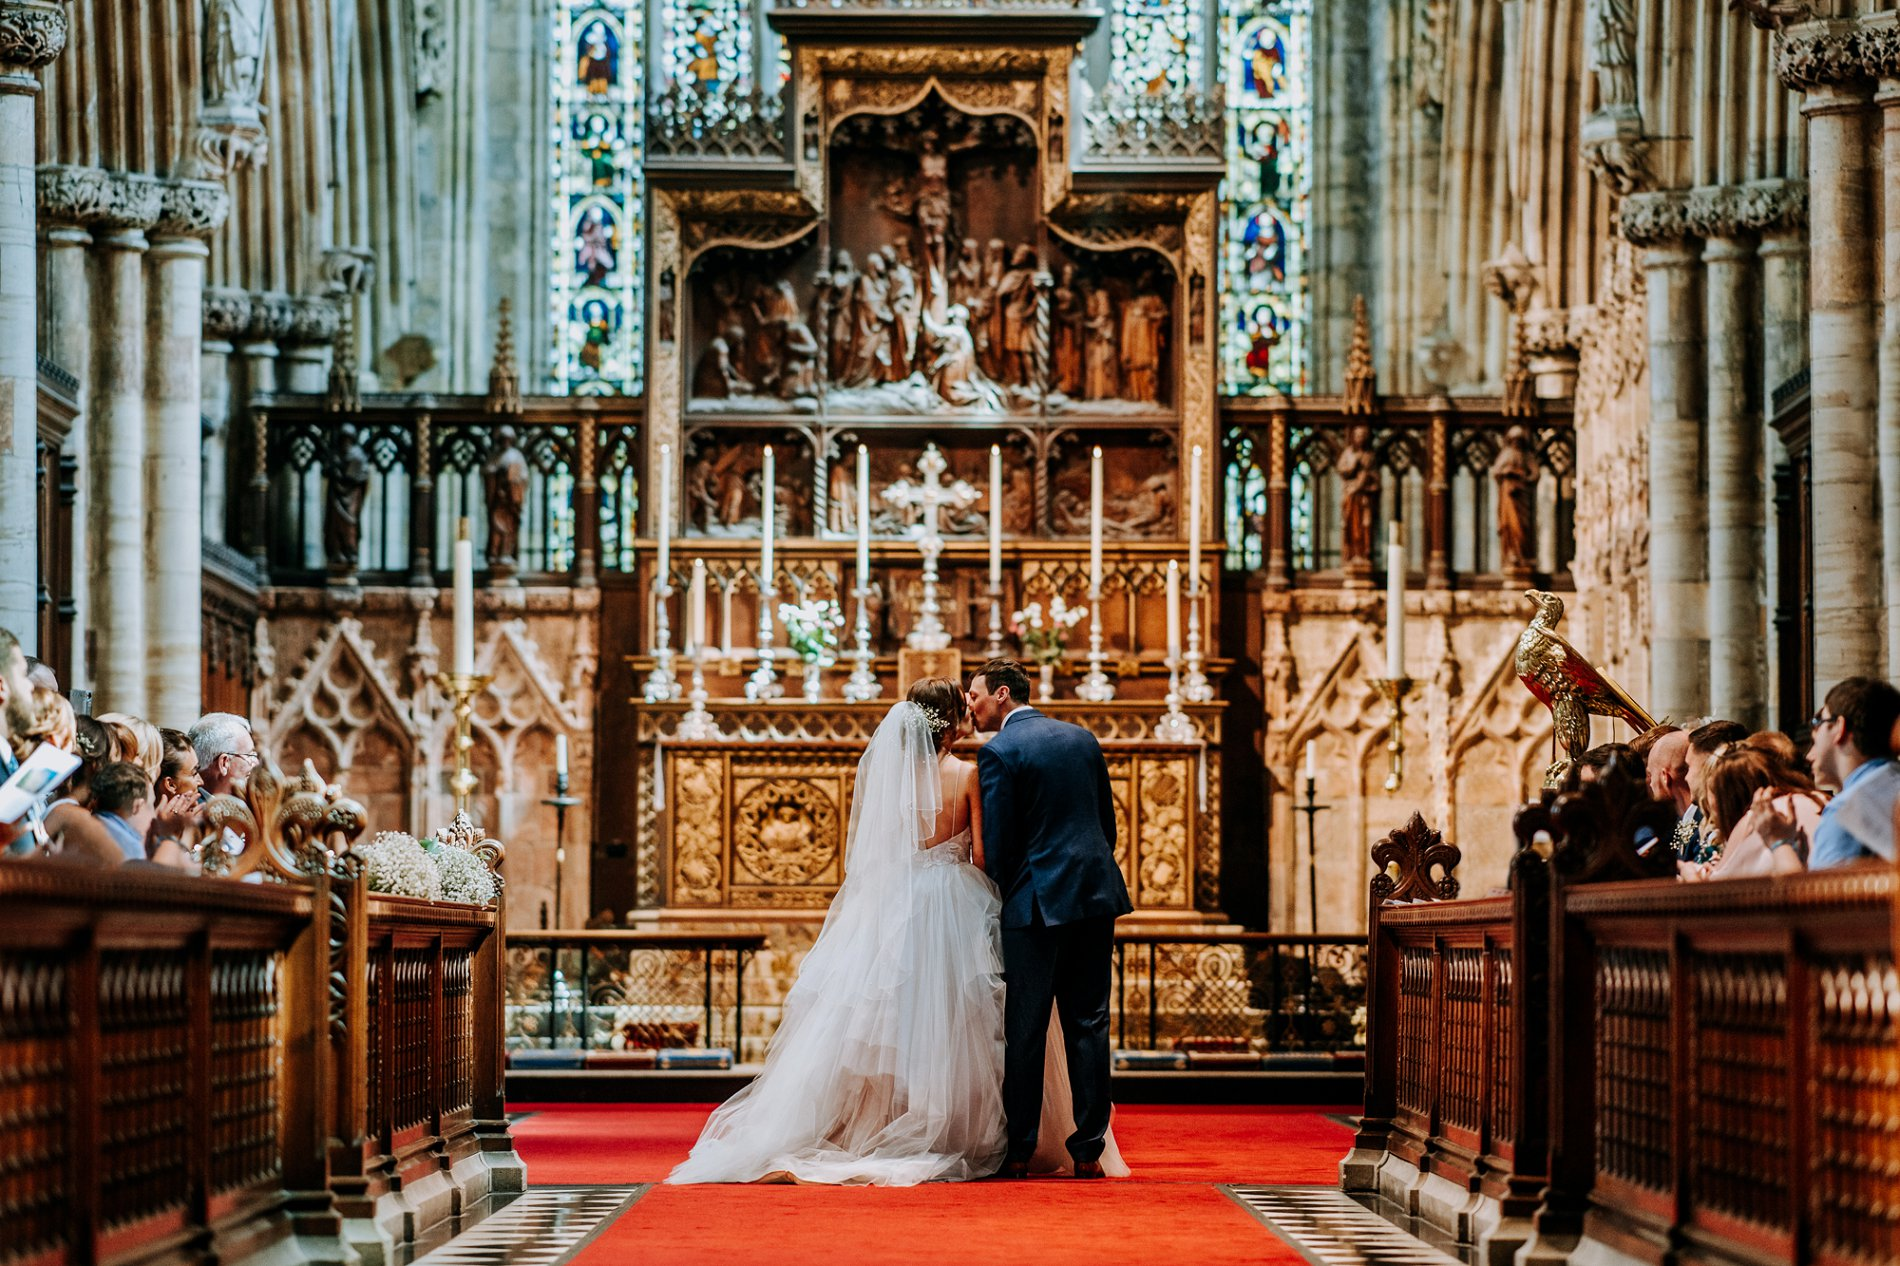 M & G Wedding Photography (11)